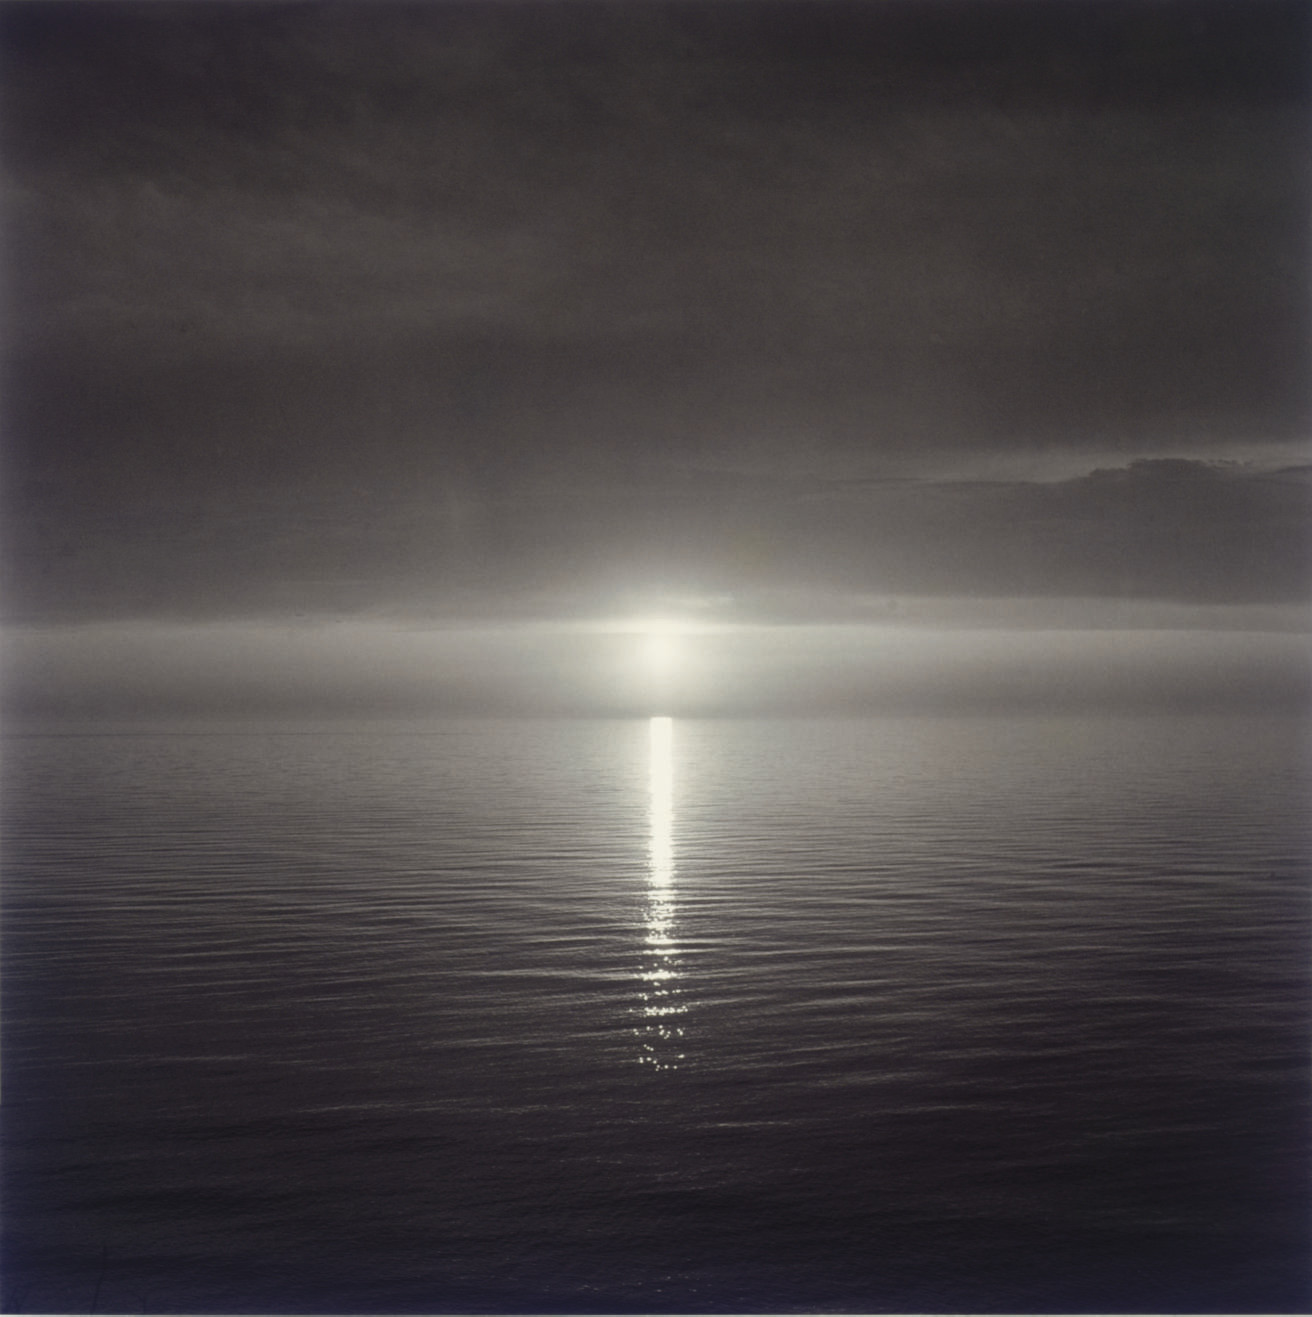 Evening/Northumberland Strait II, 1993